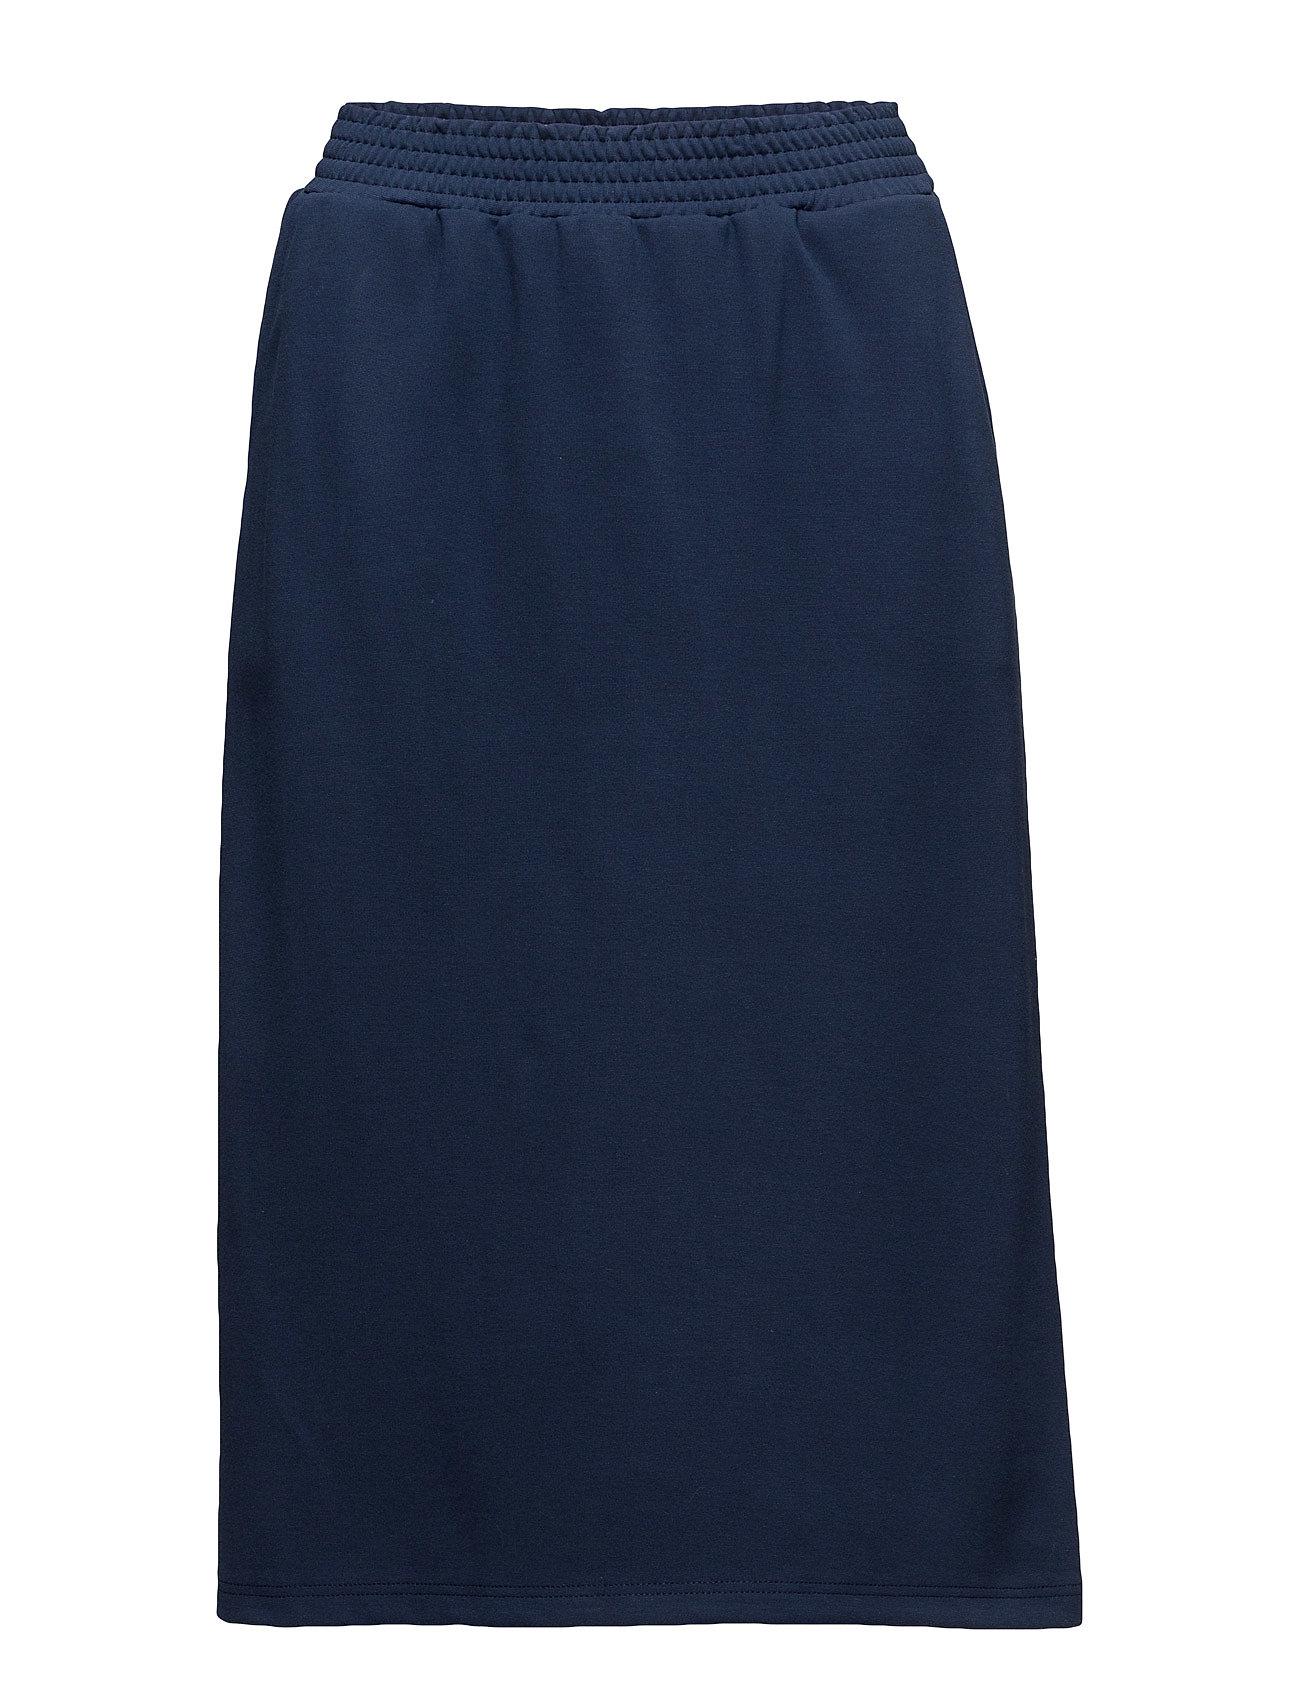 nanso – Ladies skirt, kuulas på boozt.com dk